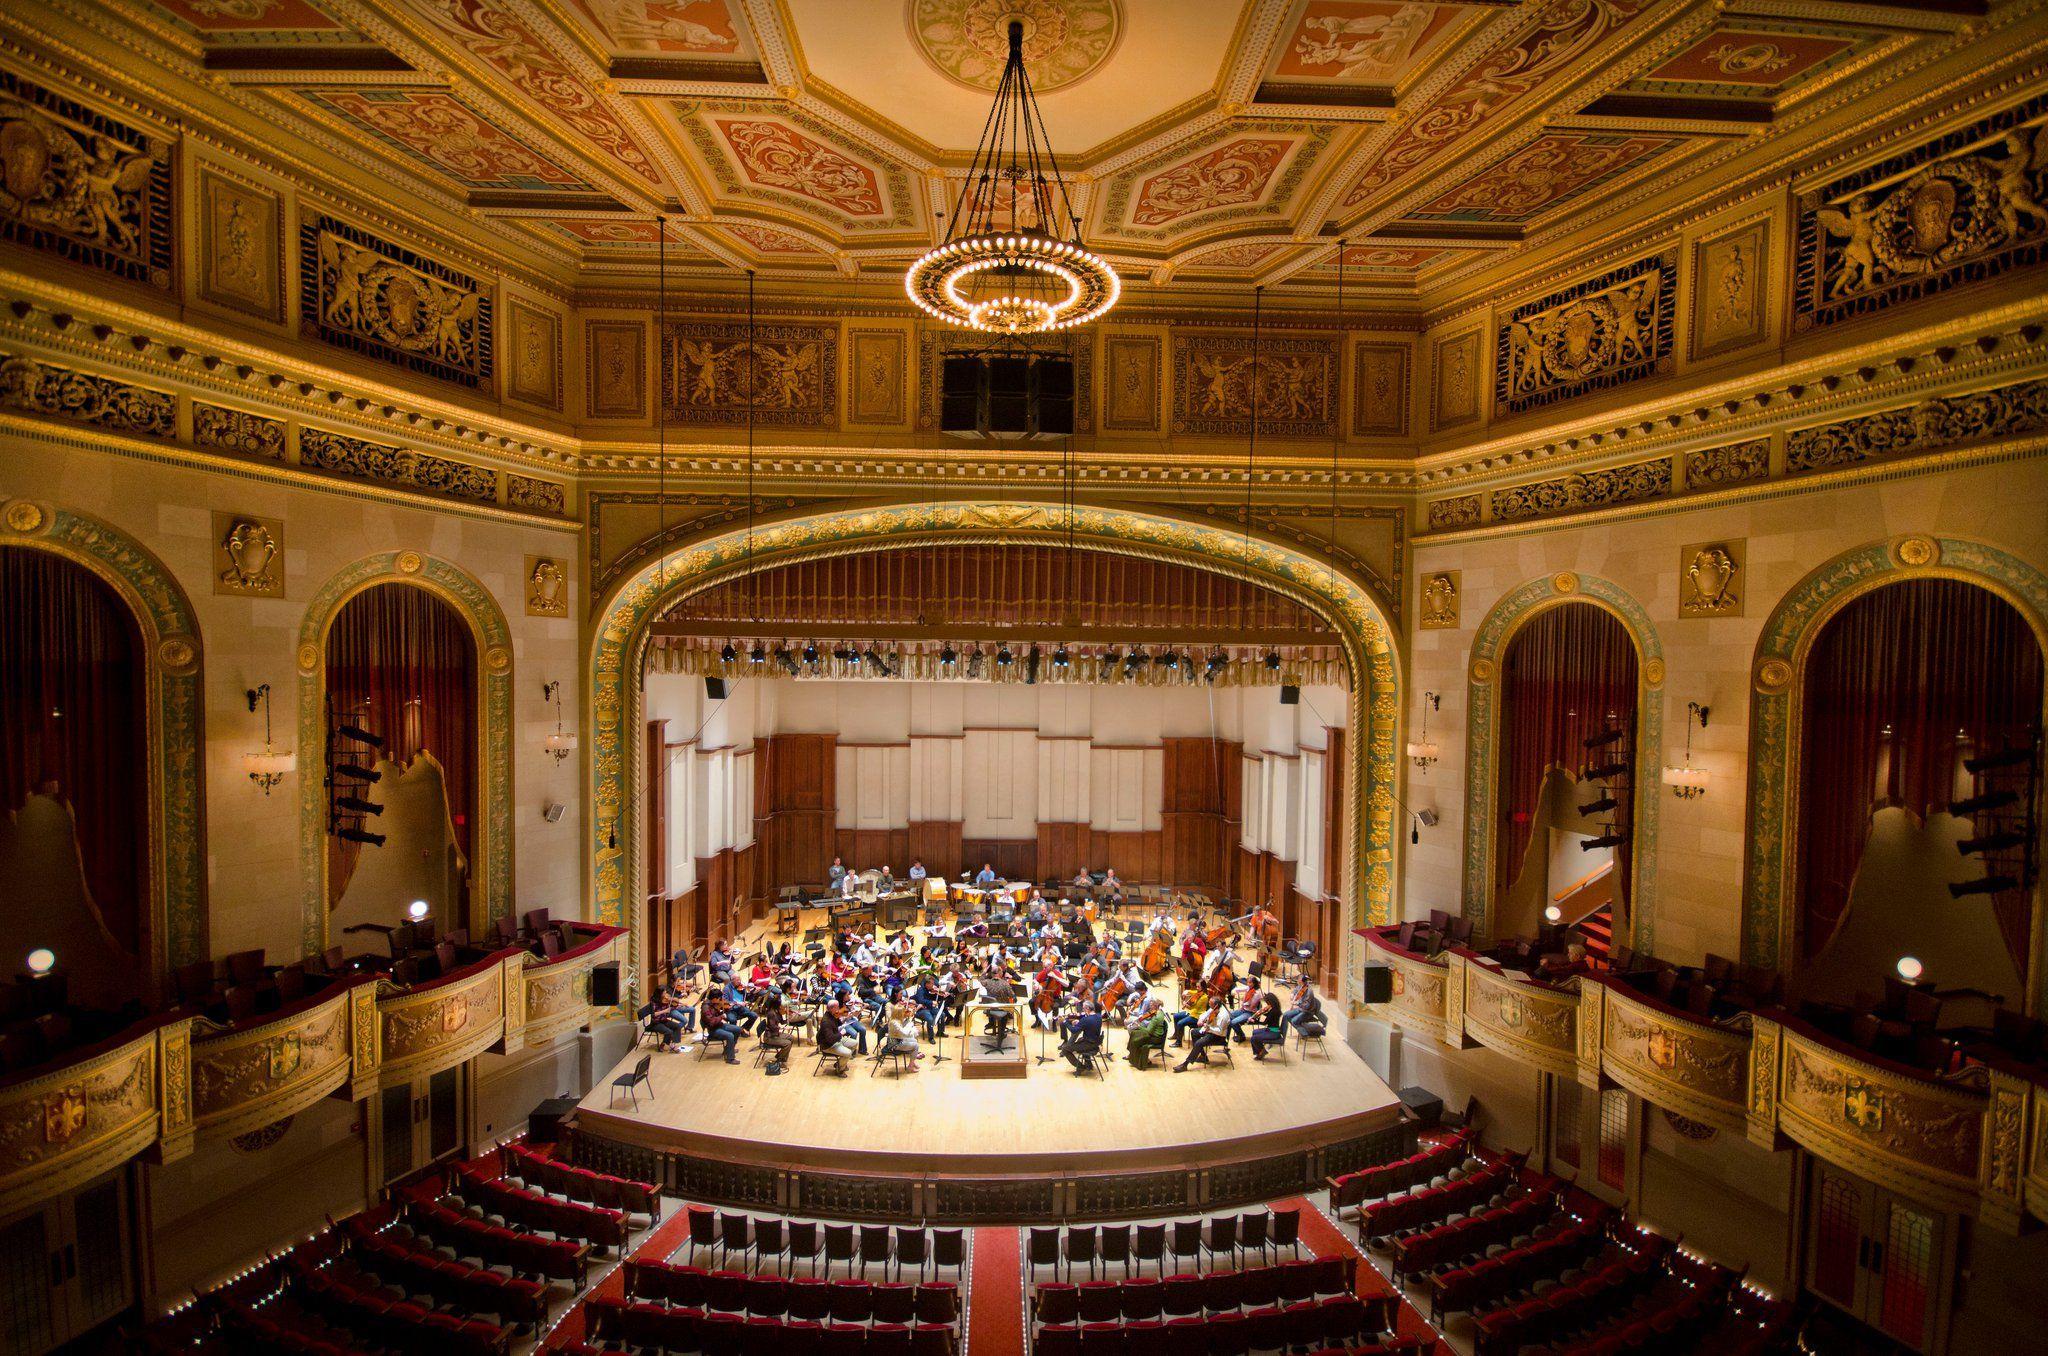 orchestra hall detroit michigan | AFTER RENOVATION | Lovin\' Detroit ...